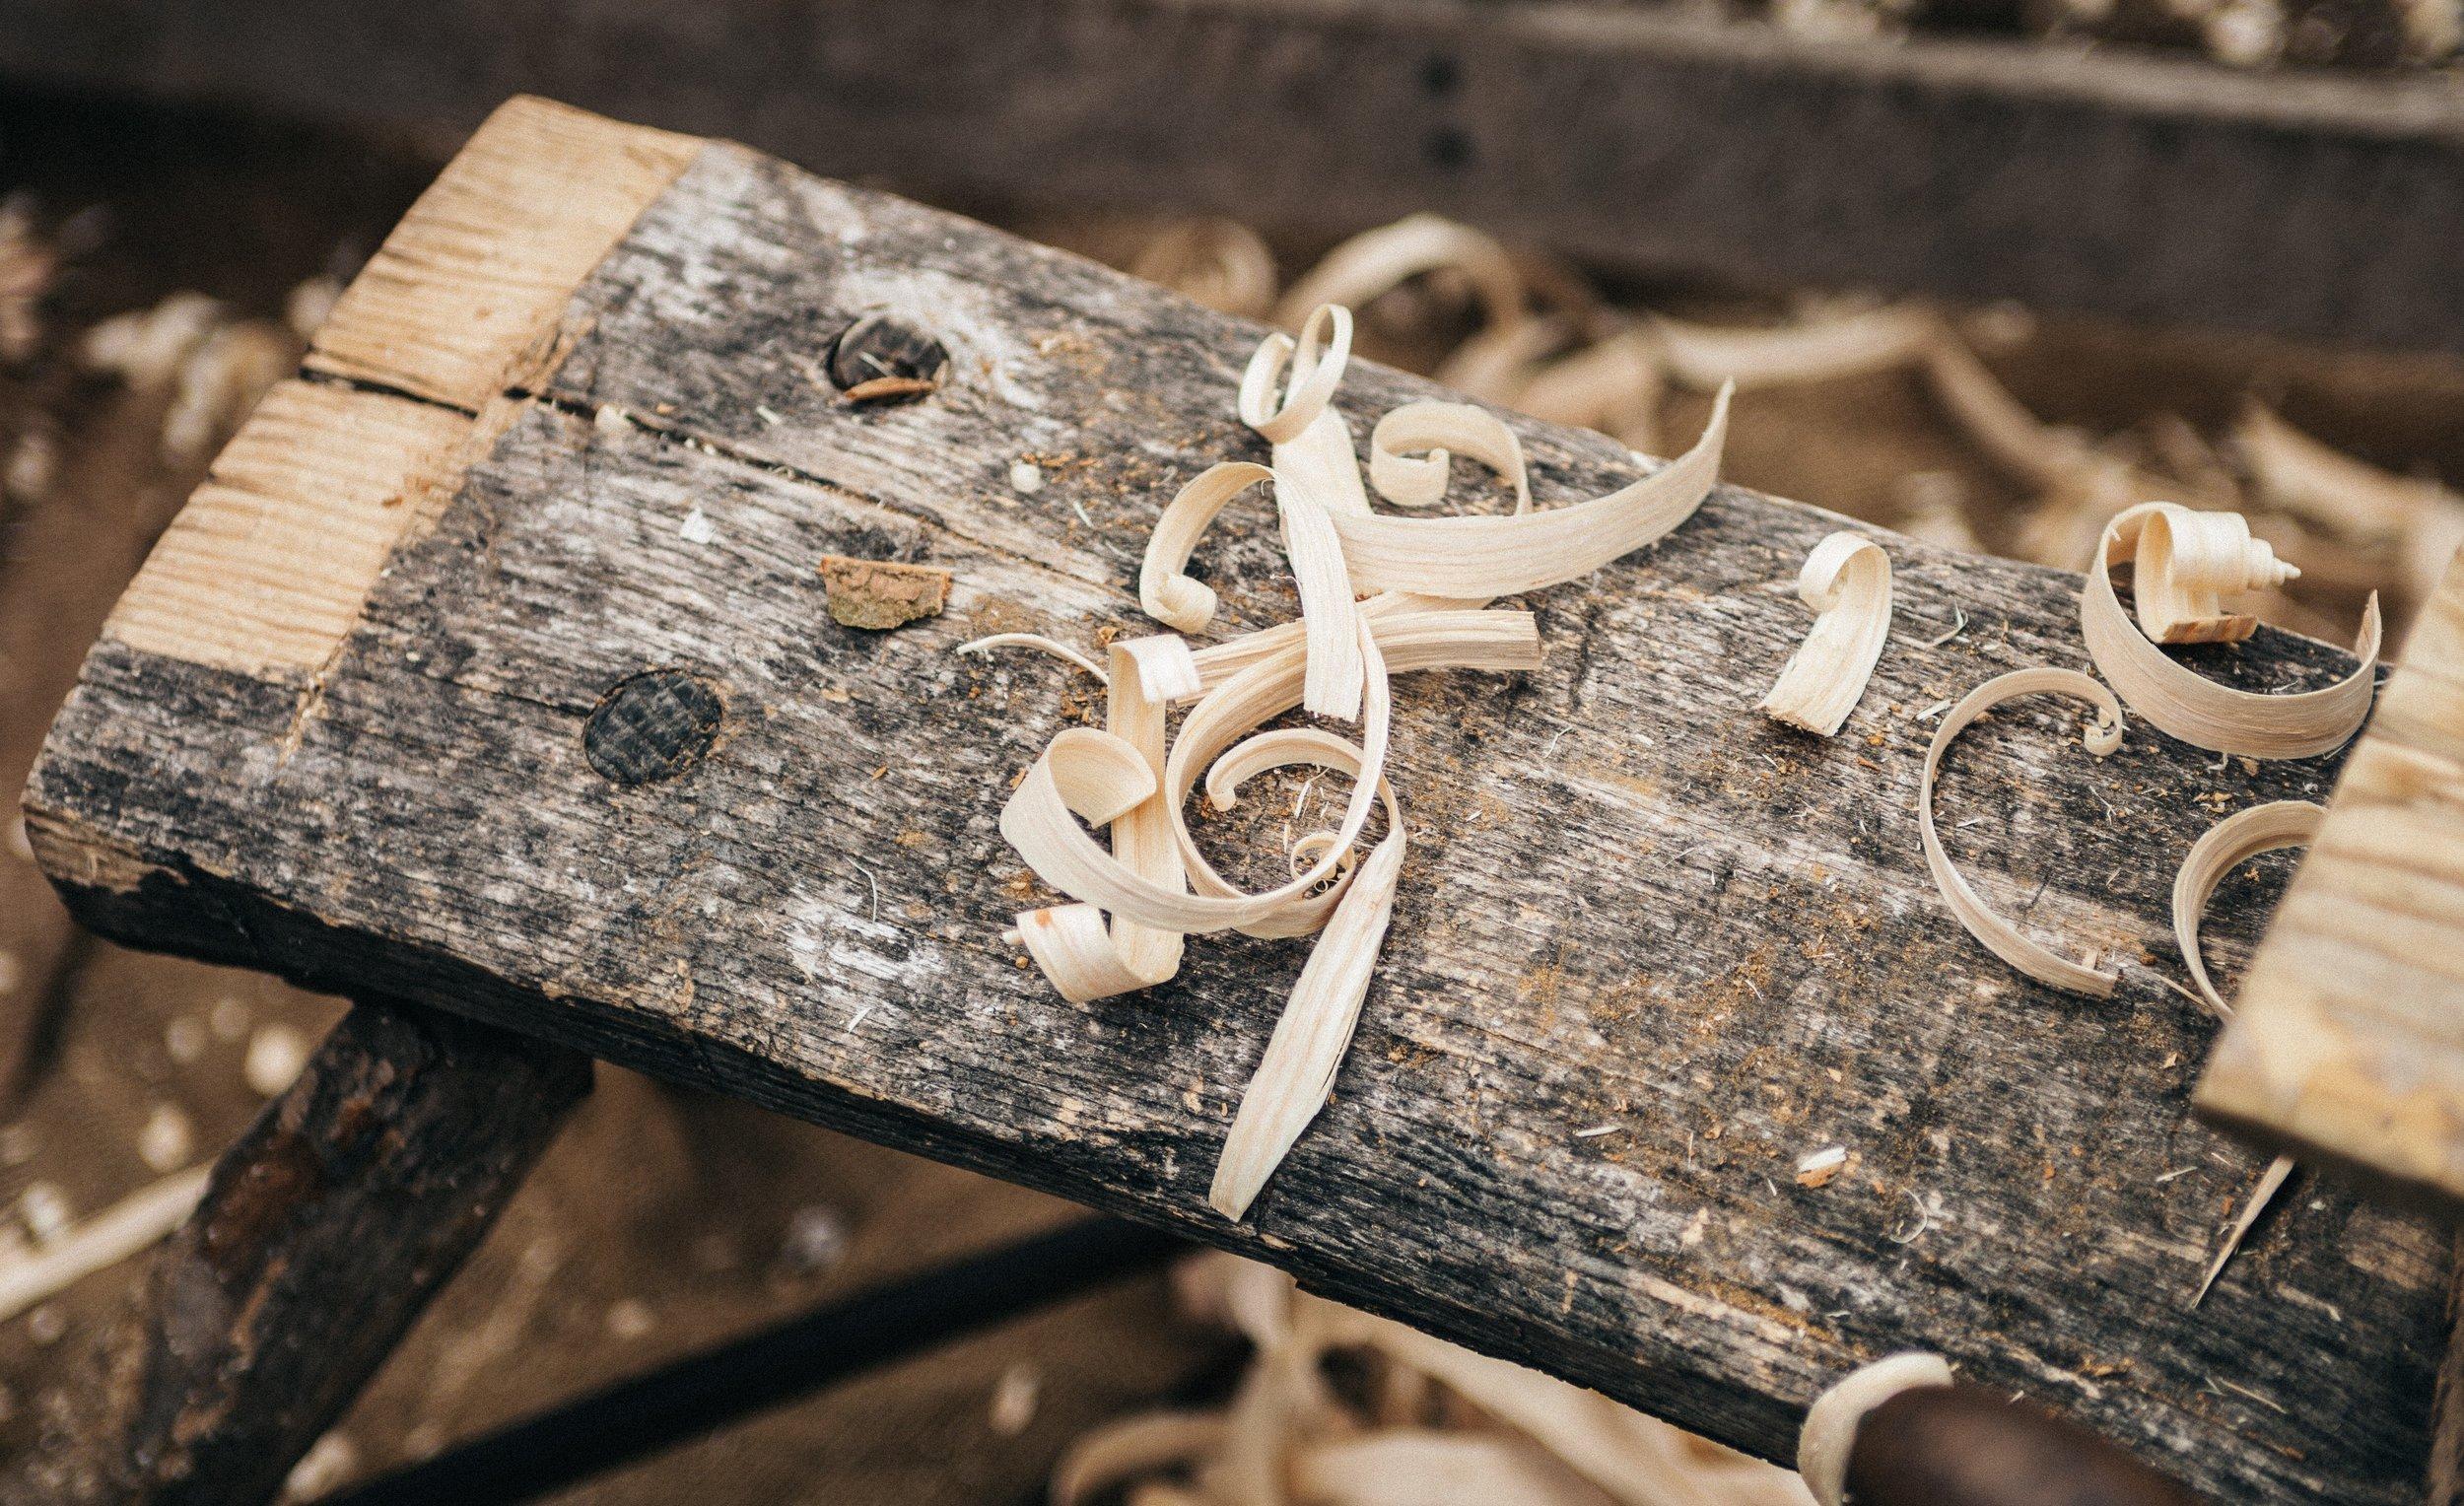 arts-and-crafts-carpenter-carpentry-175709.jpg